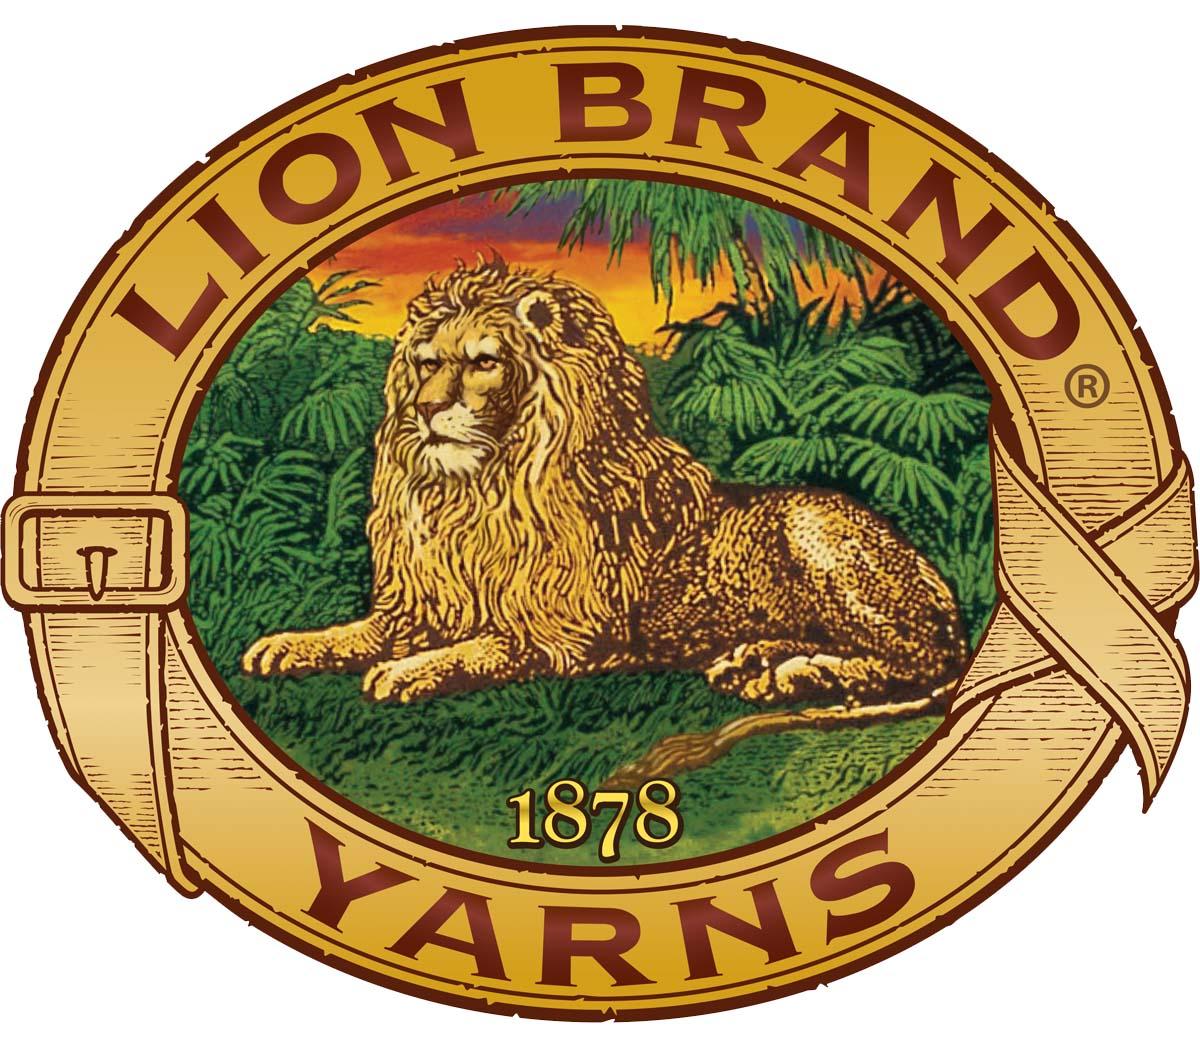 Lion Brand Yarn AllFreeCrochet.com